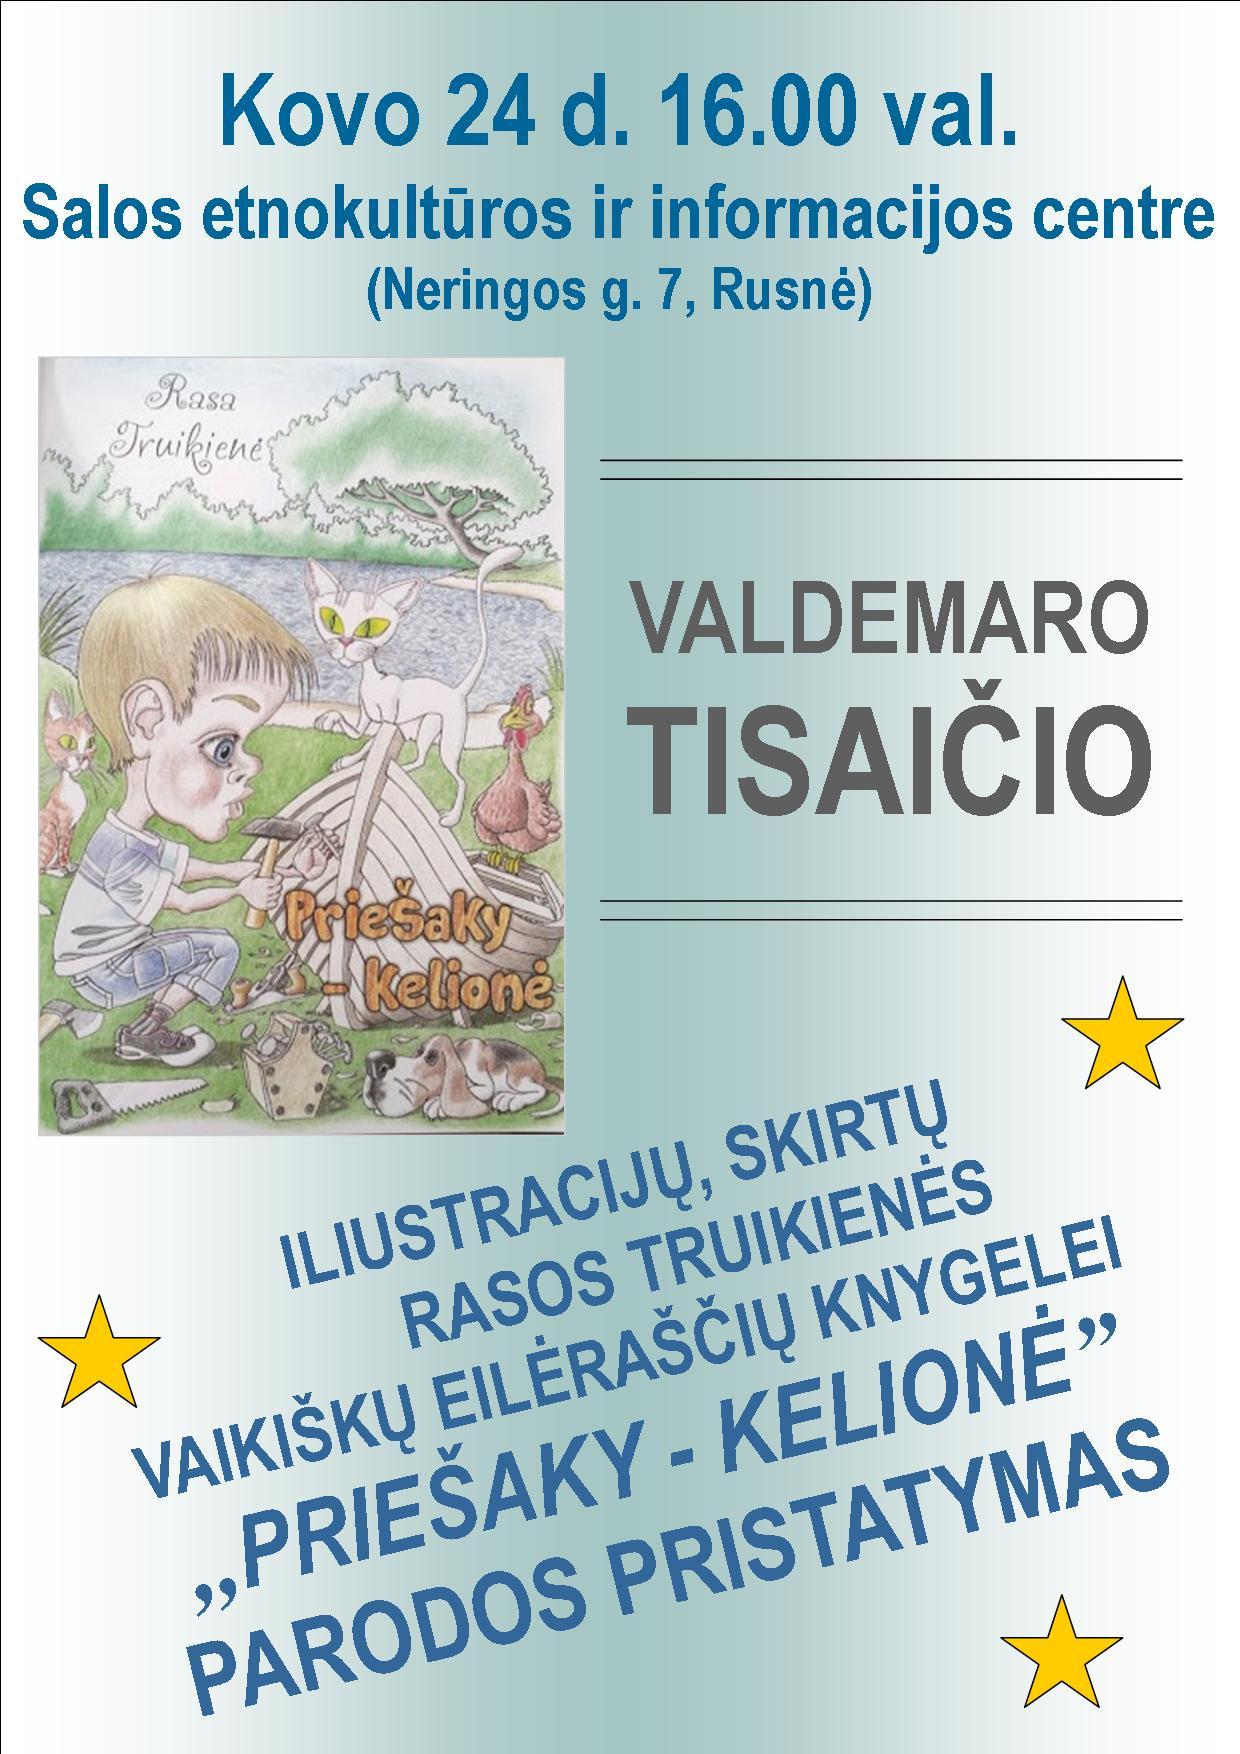 tisaicio 2-1